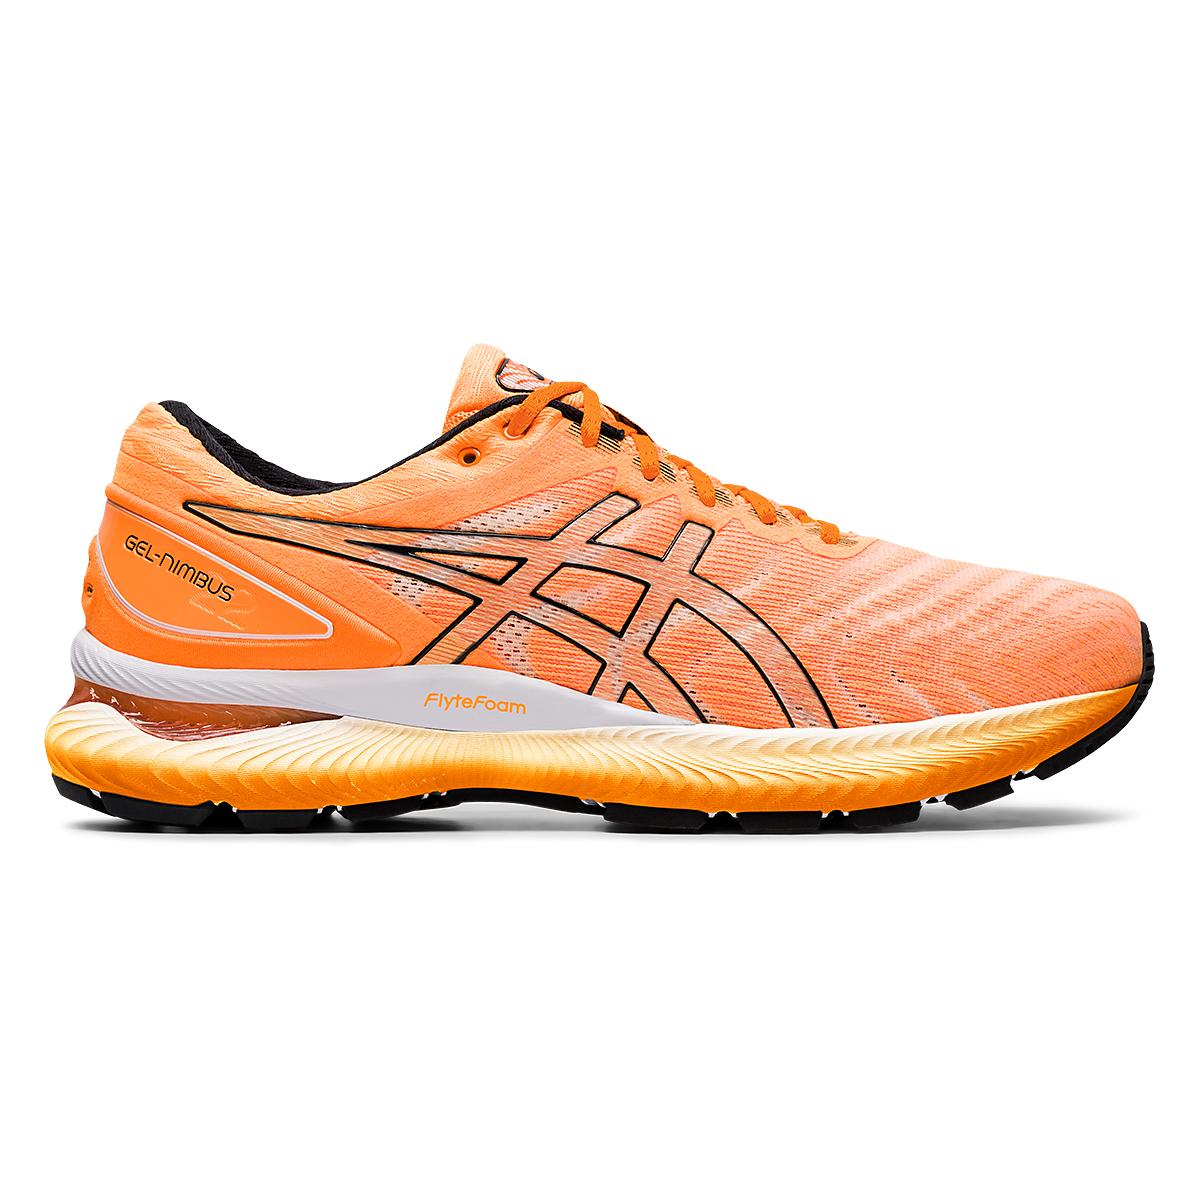 Men's Asics GEL-Nimbus 22 Modern Tokyo Running Shoe - Color: Orange Pop/Black - Size: 6 - Width: Regular, Orange Pop/Black, large, image 1